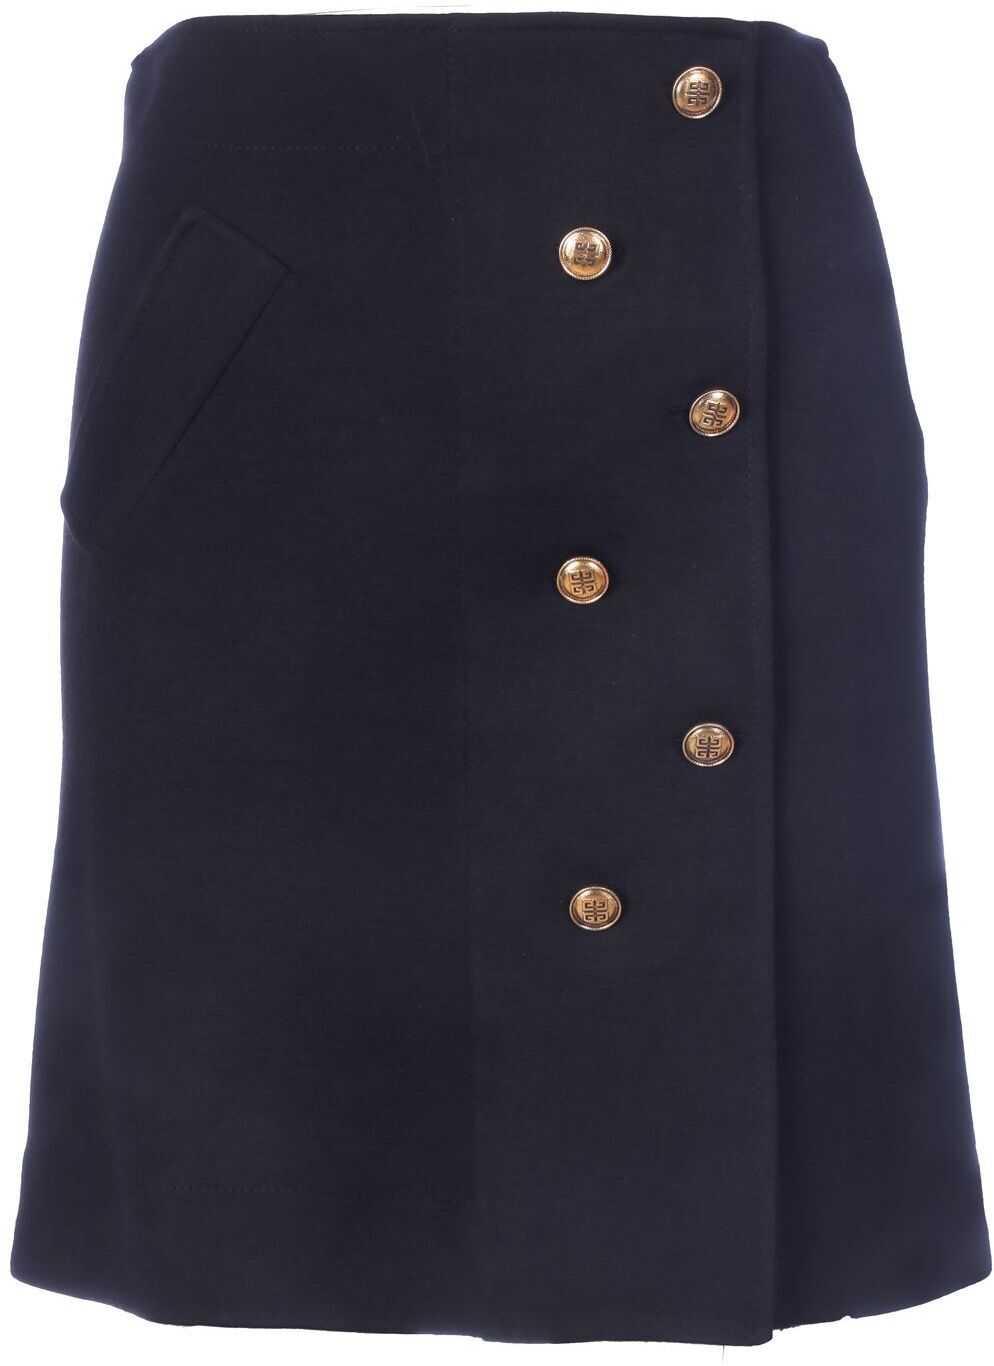 Givenchy Polyamide Skirt BLACK